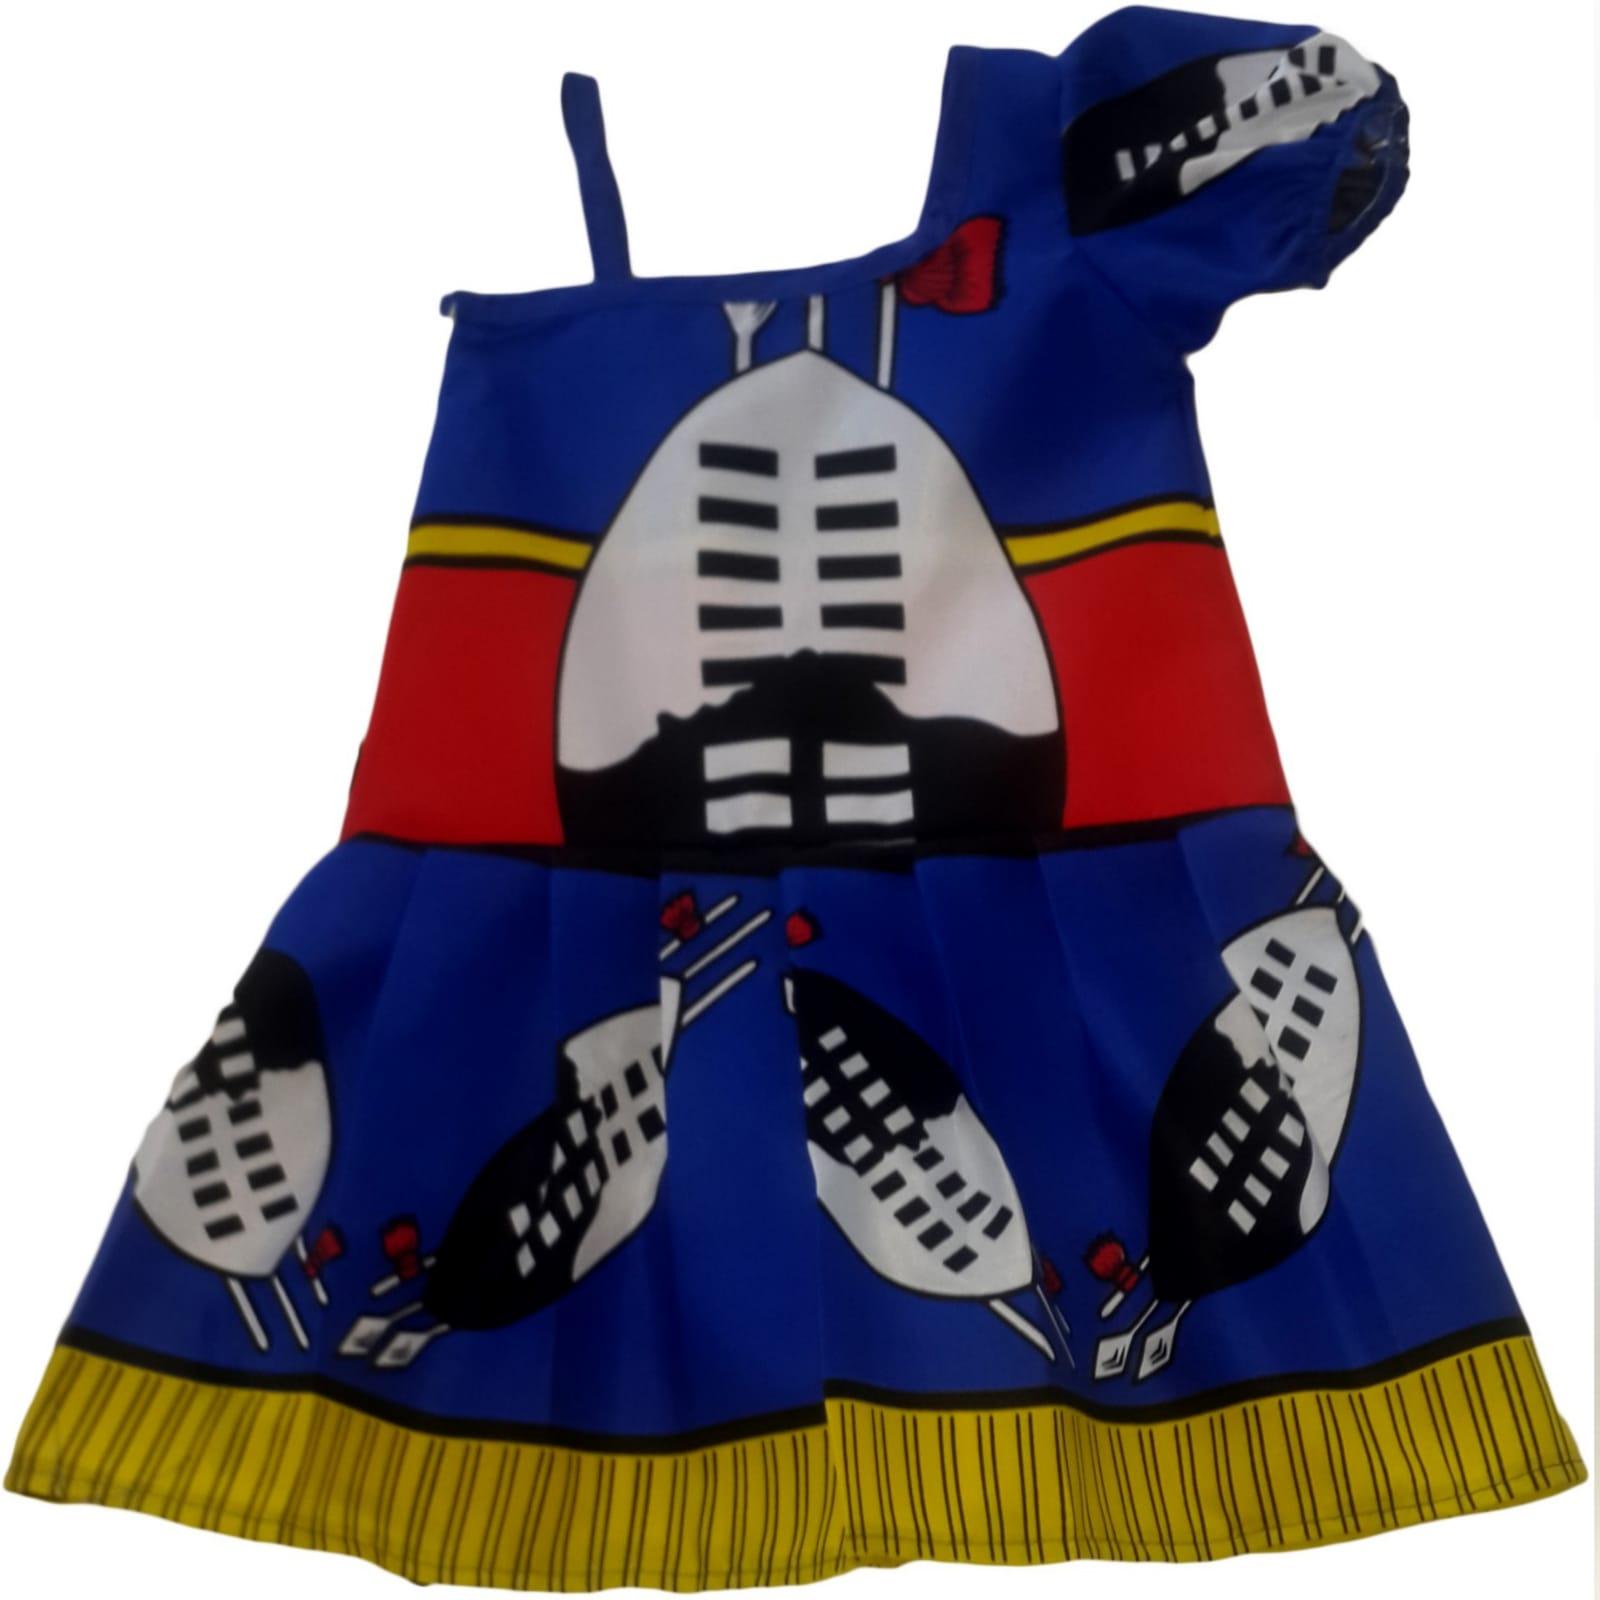 Swati traditional wedding attire 9 mens swazi/swati short sleeve shirt. High waisted swazi/swati skirt. High waisted pleated swazi/swati skirt with crossed shoulder straps. One sleeve little girls swazi/swati dress with shoulder strap. Traditional wedding attire